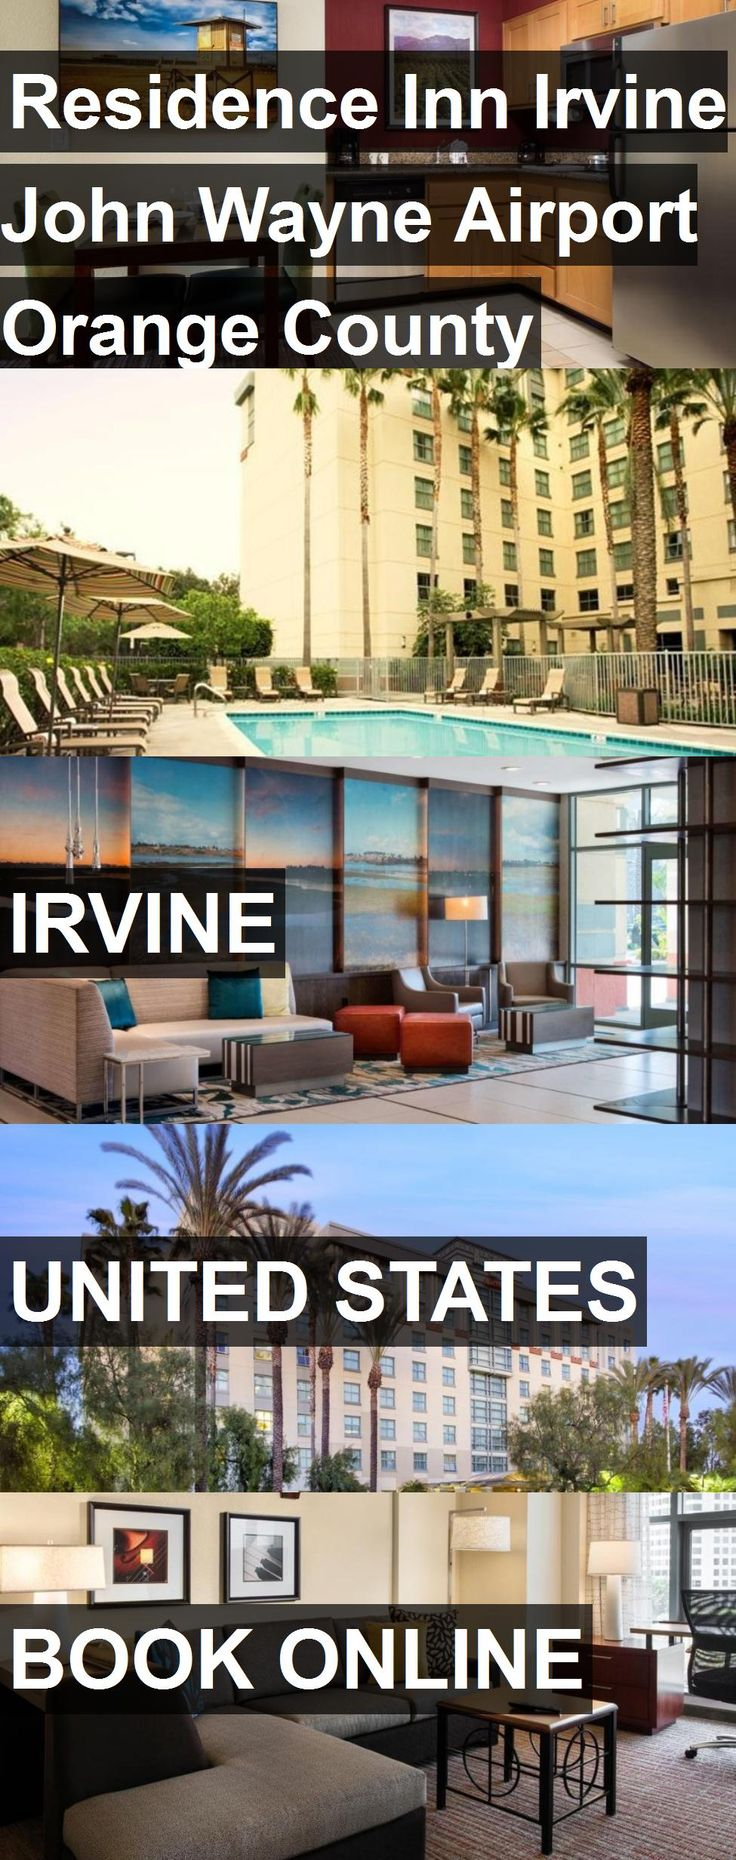 Hotel Residence Inn Irvine John Wayne Airport Orange County in Irvine, United States. For more information, photos, reviews and best prices please follow the link. #UnitedStates #Irvine #ResidenceInnIrvineJohnWayneAirportOrangeCounty #hotel #travel #vacation